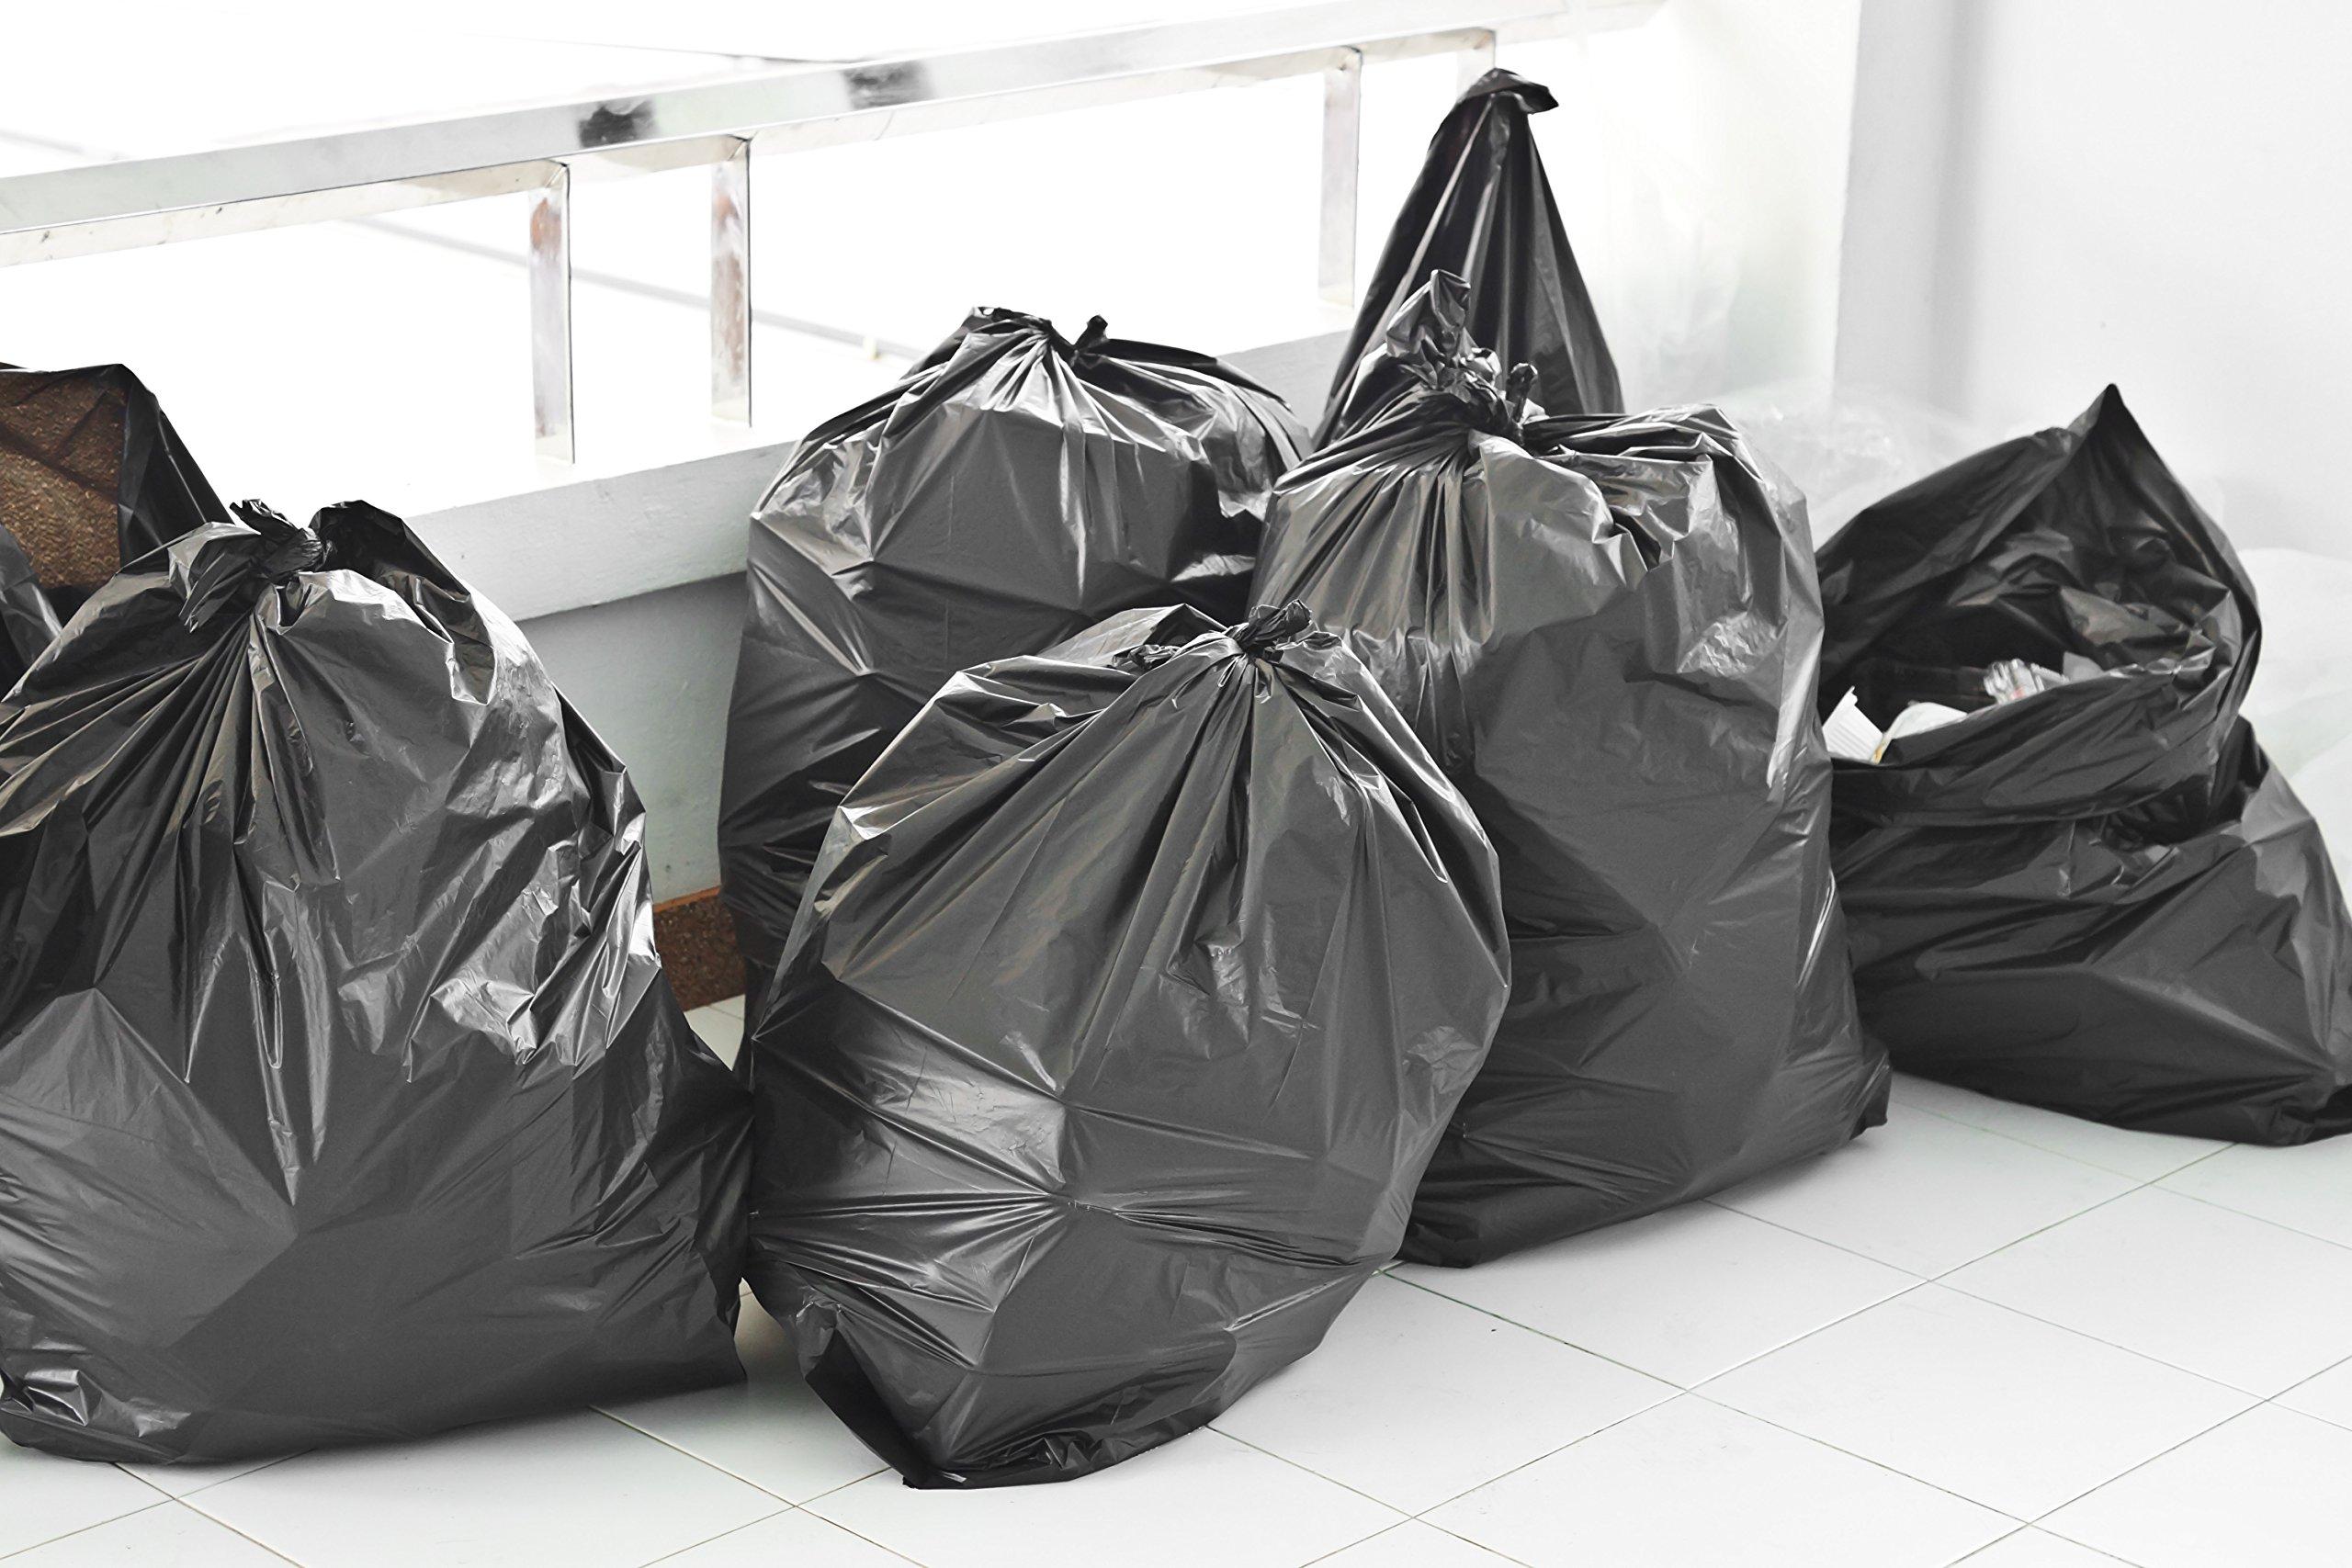 Toughbag 95 Gal Trash bags, Black, 2 Mil, 61x68, 25 Garbage Bags Per Case by ToughBag (Image #2)